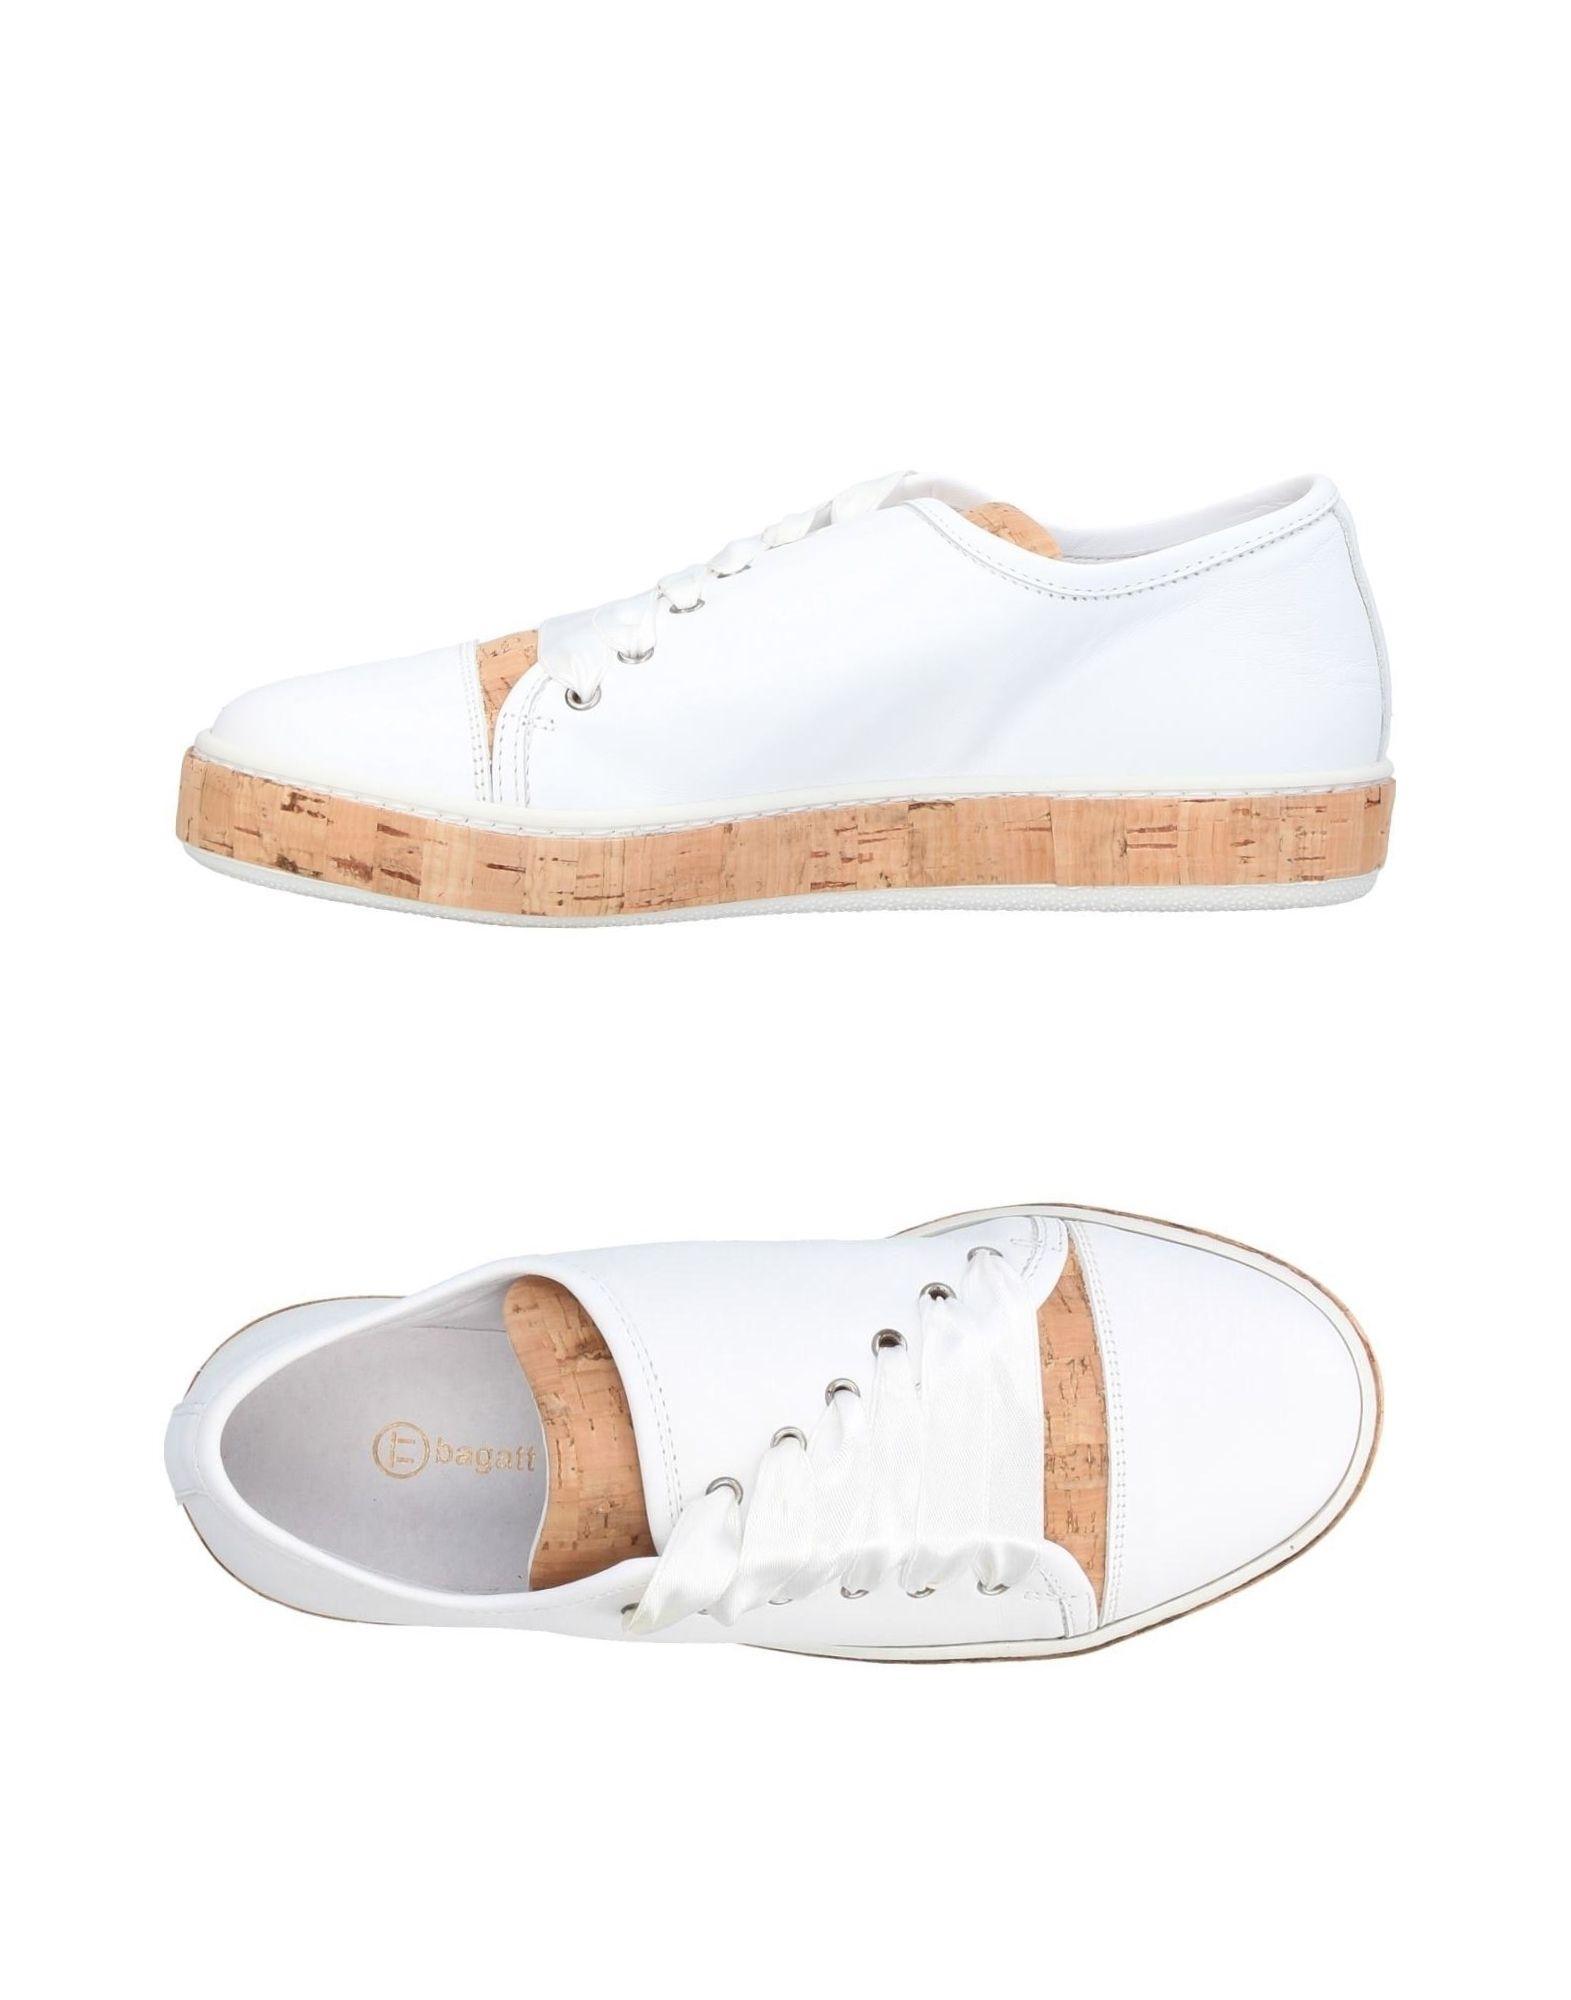 Moda Sneakers Bagatt Donna - - Donna 11411729QL 6bea38